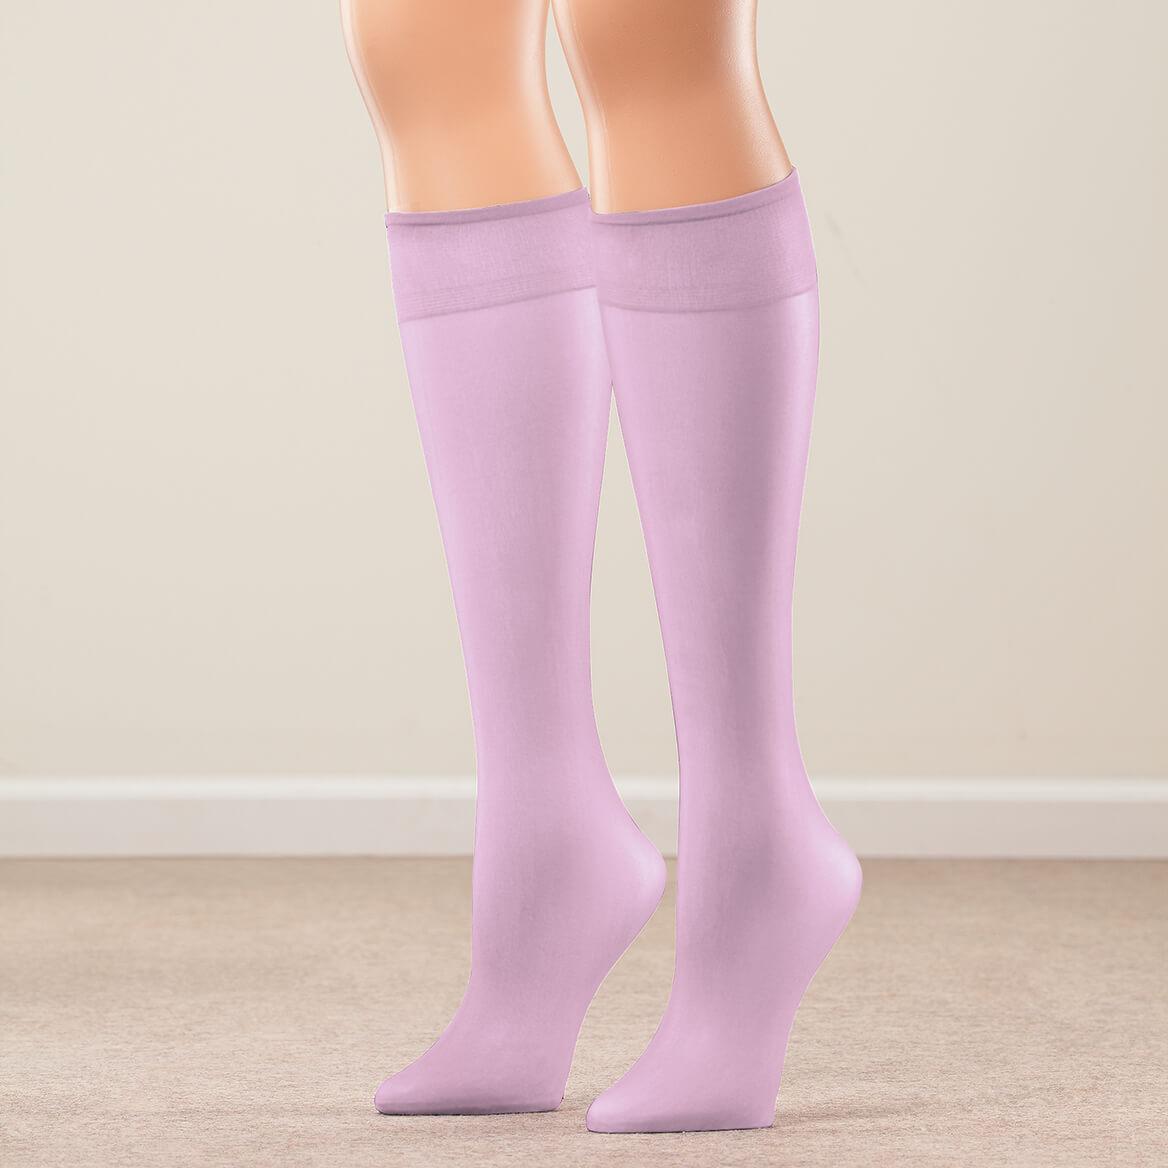 Nylon Knee Highs Set of 20 Pairs-367416